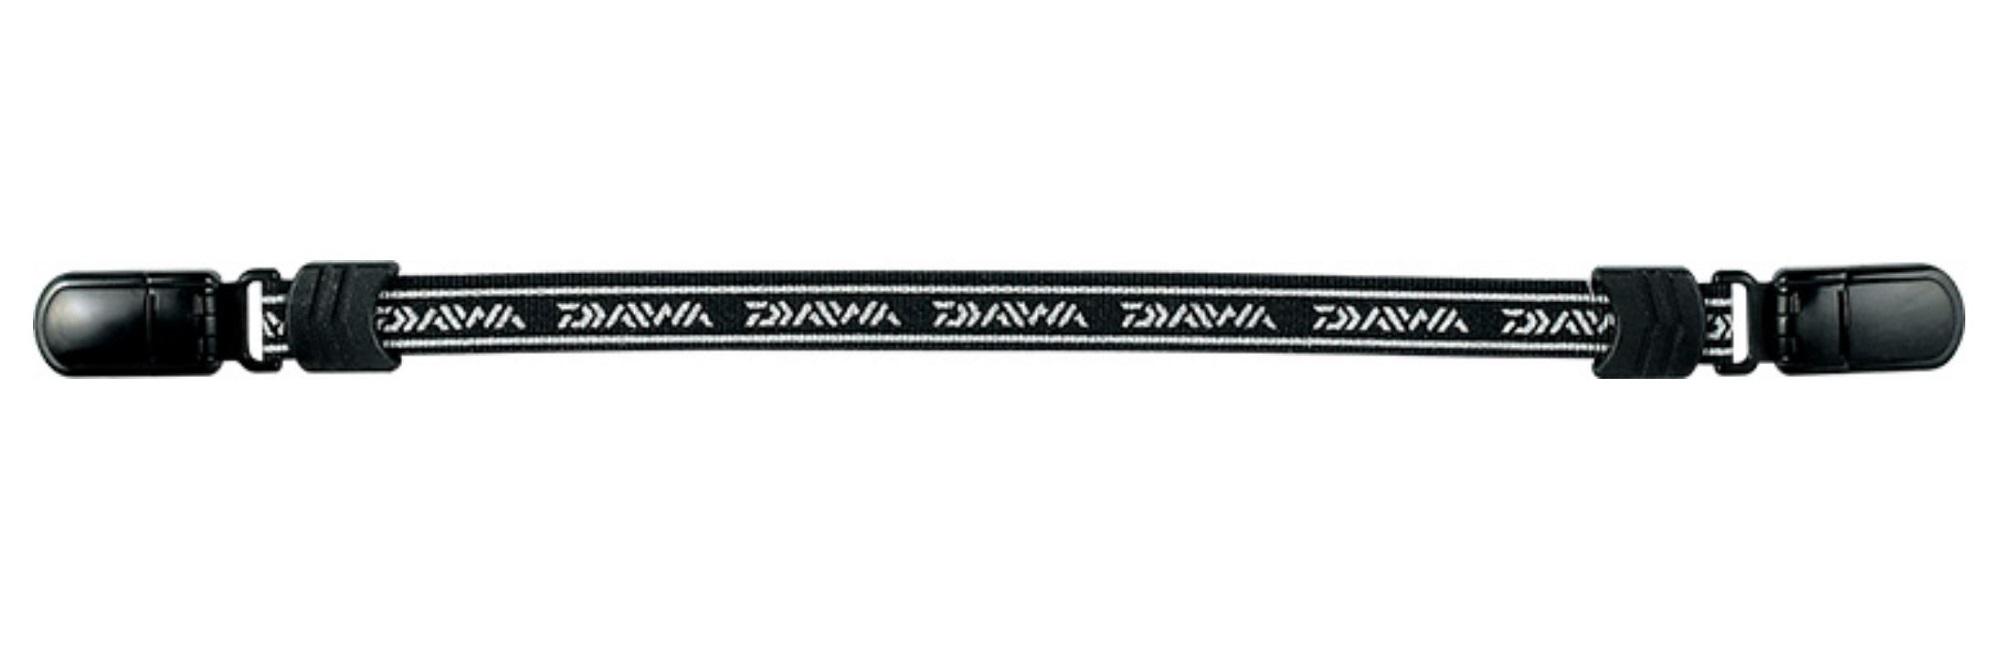 Sale Daiwa DA-9100 Clip on Cap Strap Black (7258)